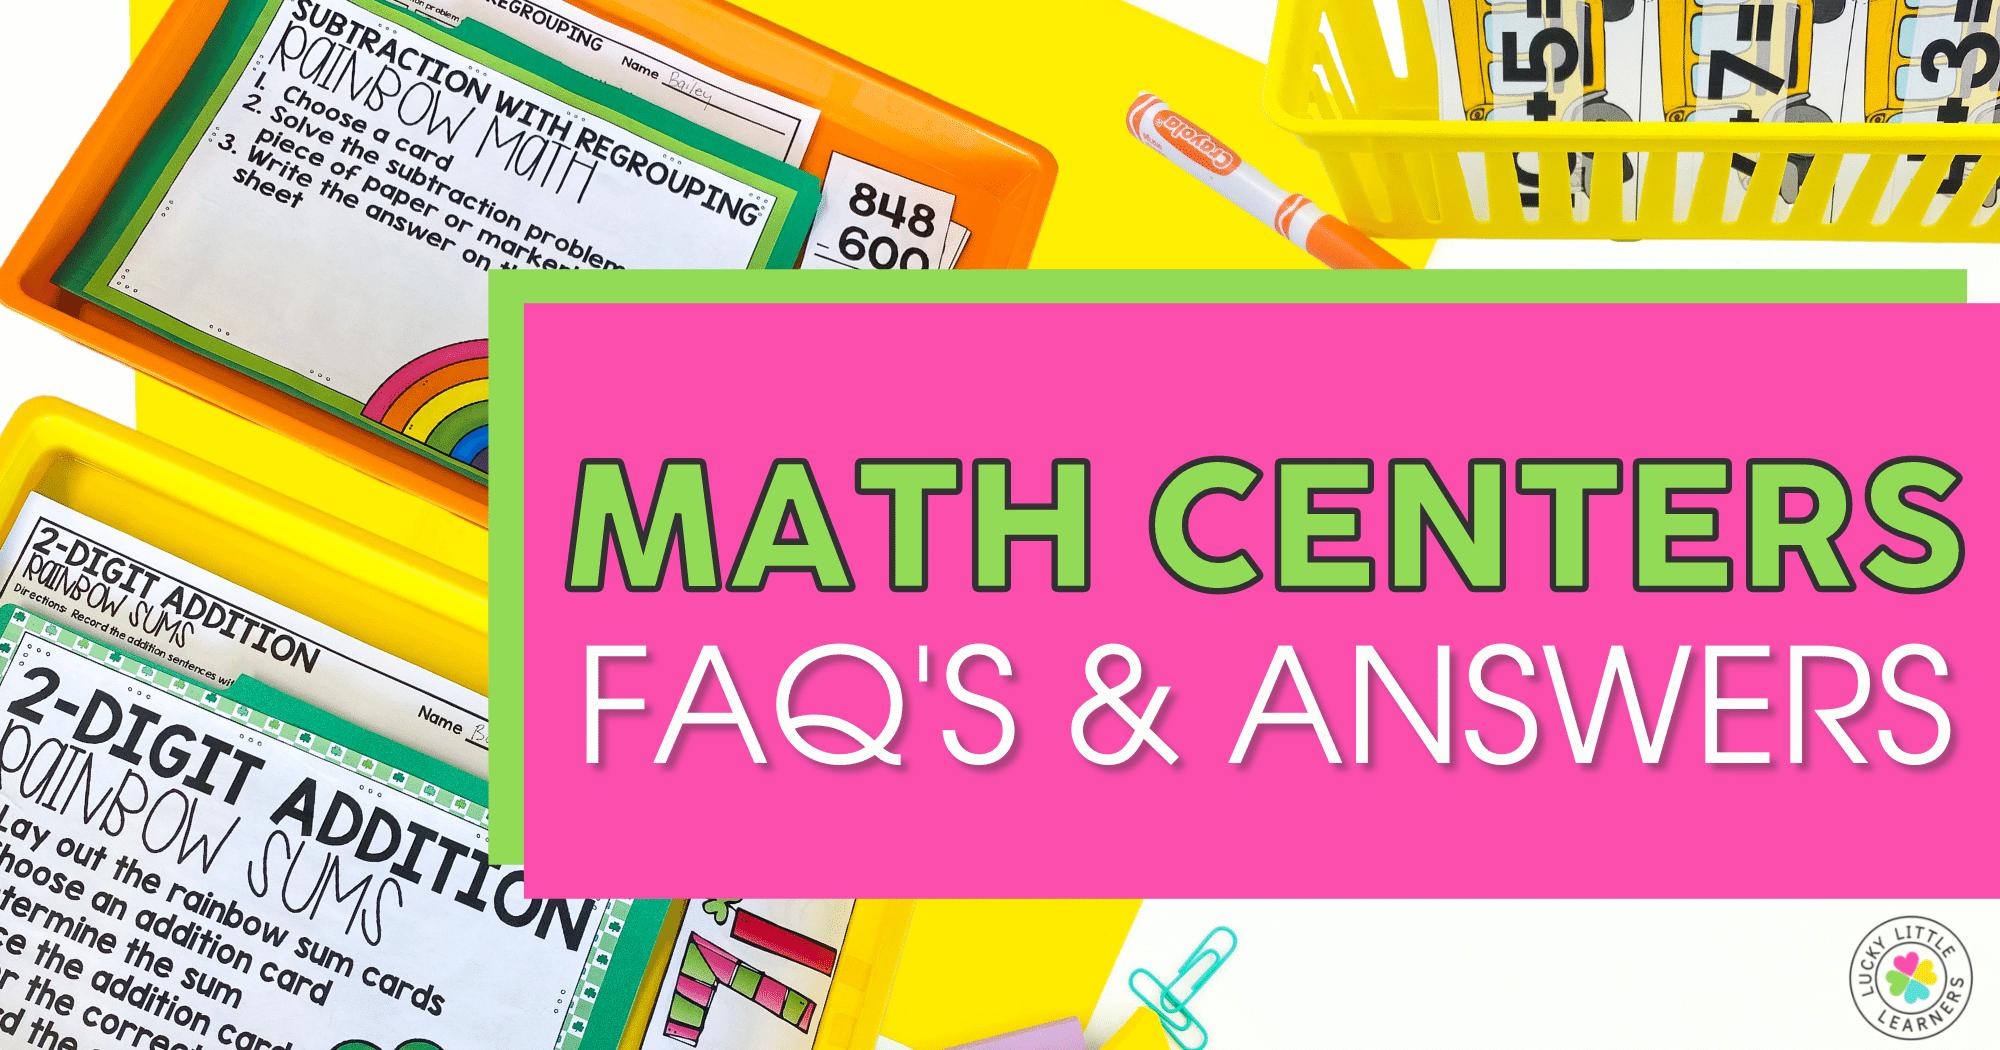 Math Center FAQ's & Answers